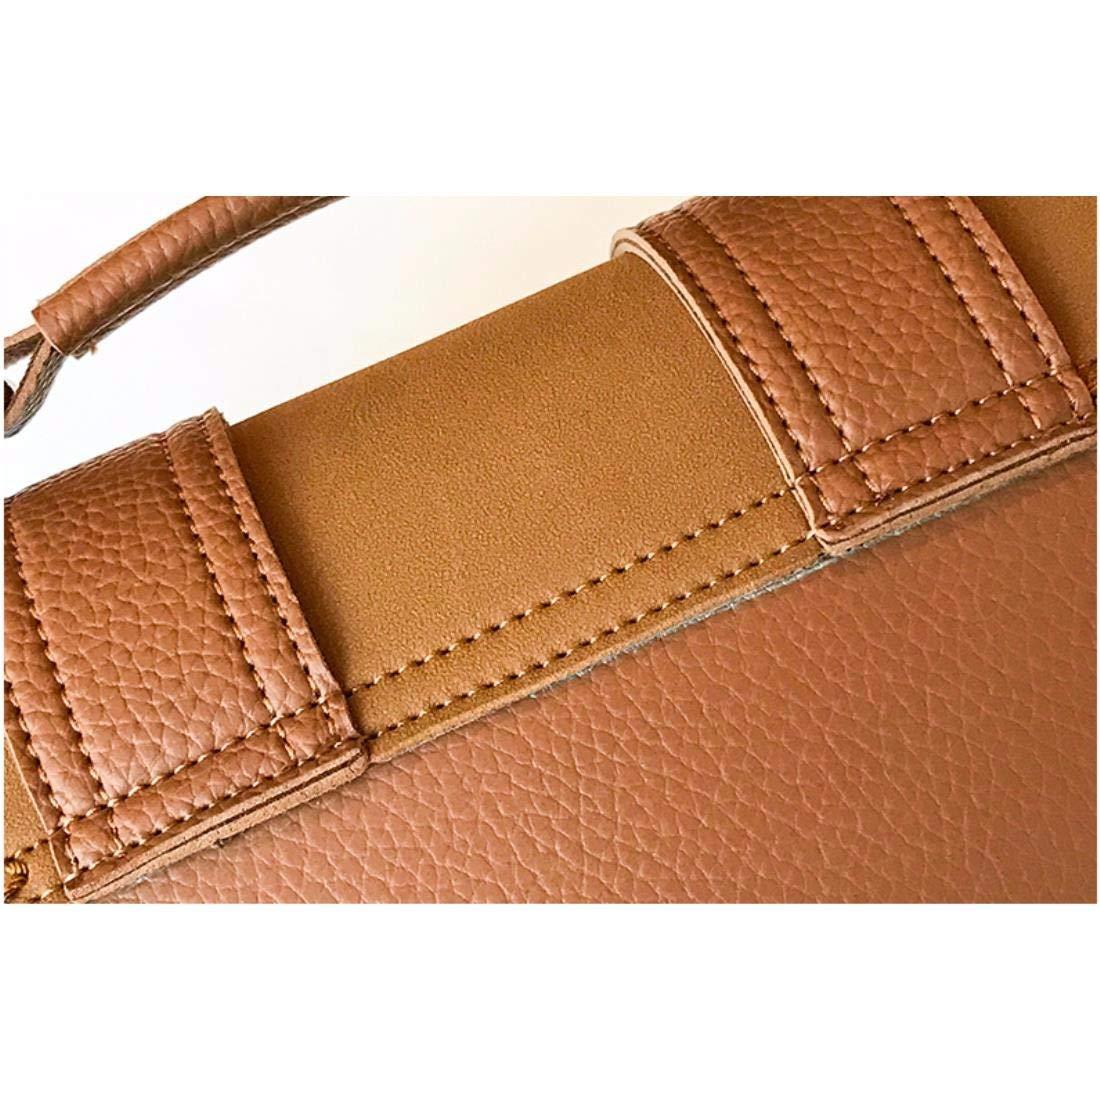 Large Capacity Handbag Shoulder Bag Wallet Long Single Shoulder Bag Shopping Bag. LIUXINDA-BB Ladies Satchel Bag